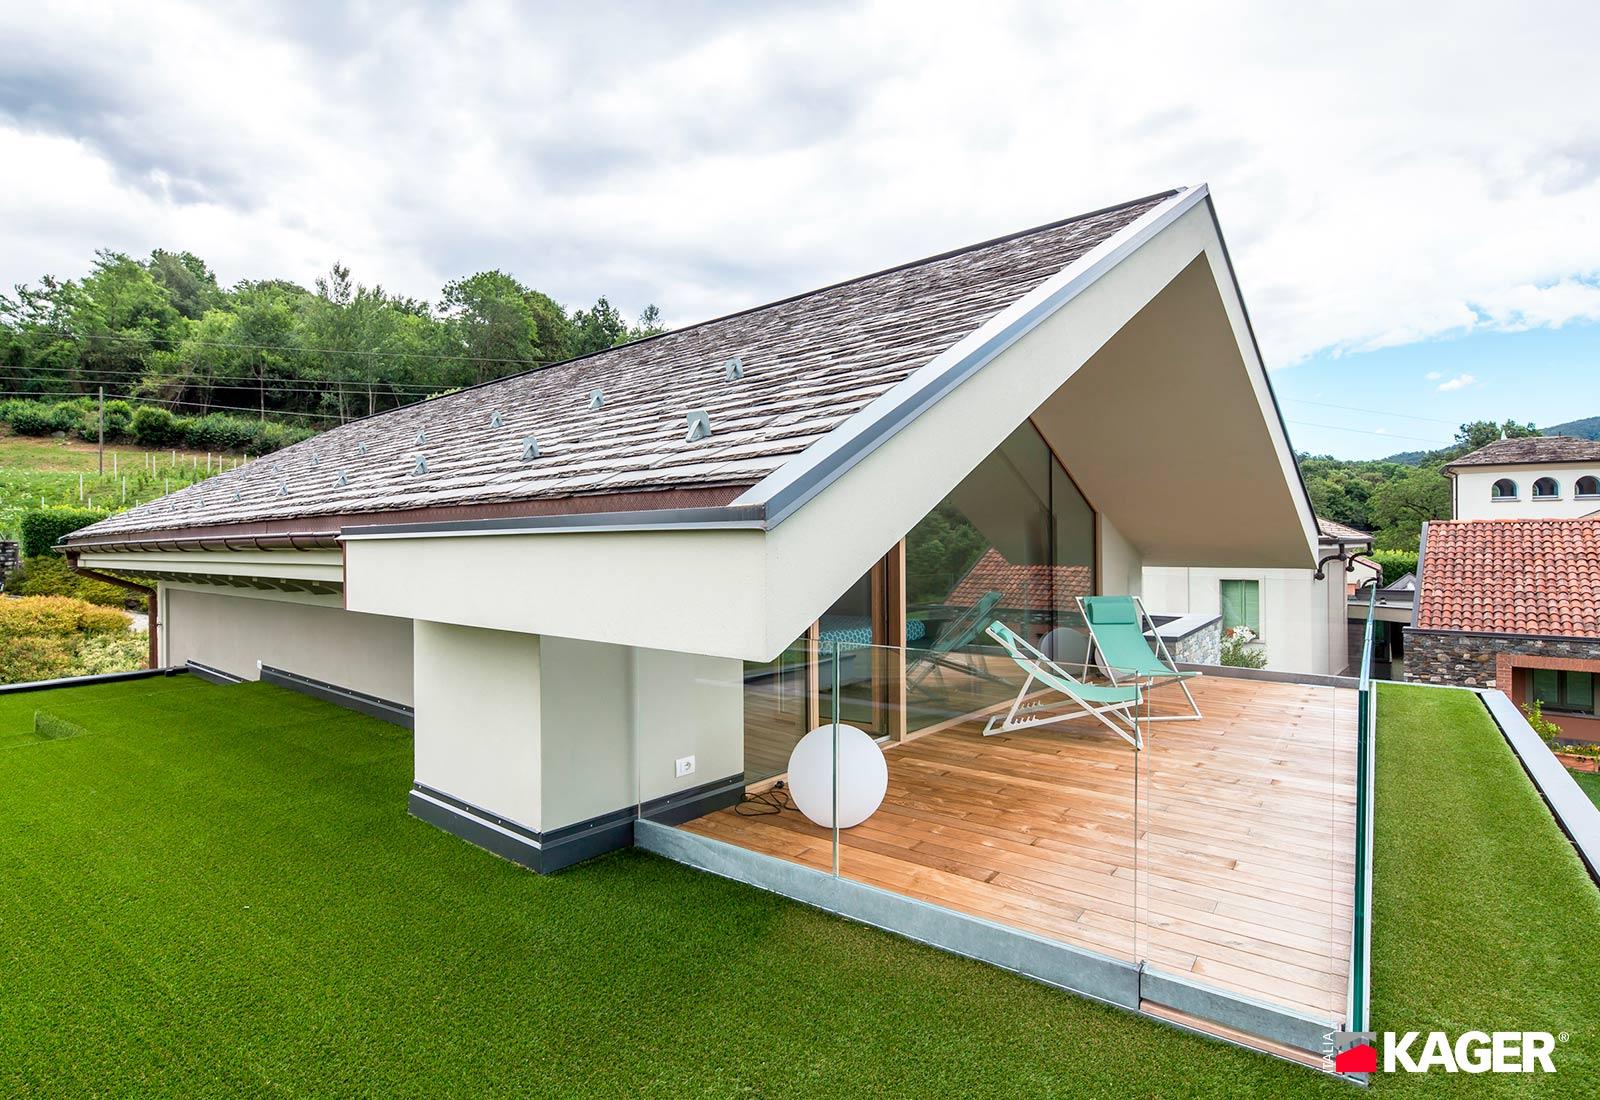 Casa-in-legno-Novara-Kager-Italia-11